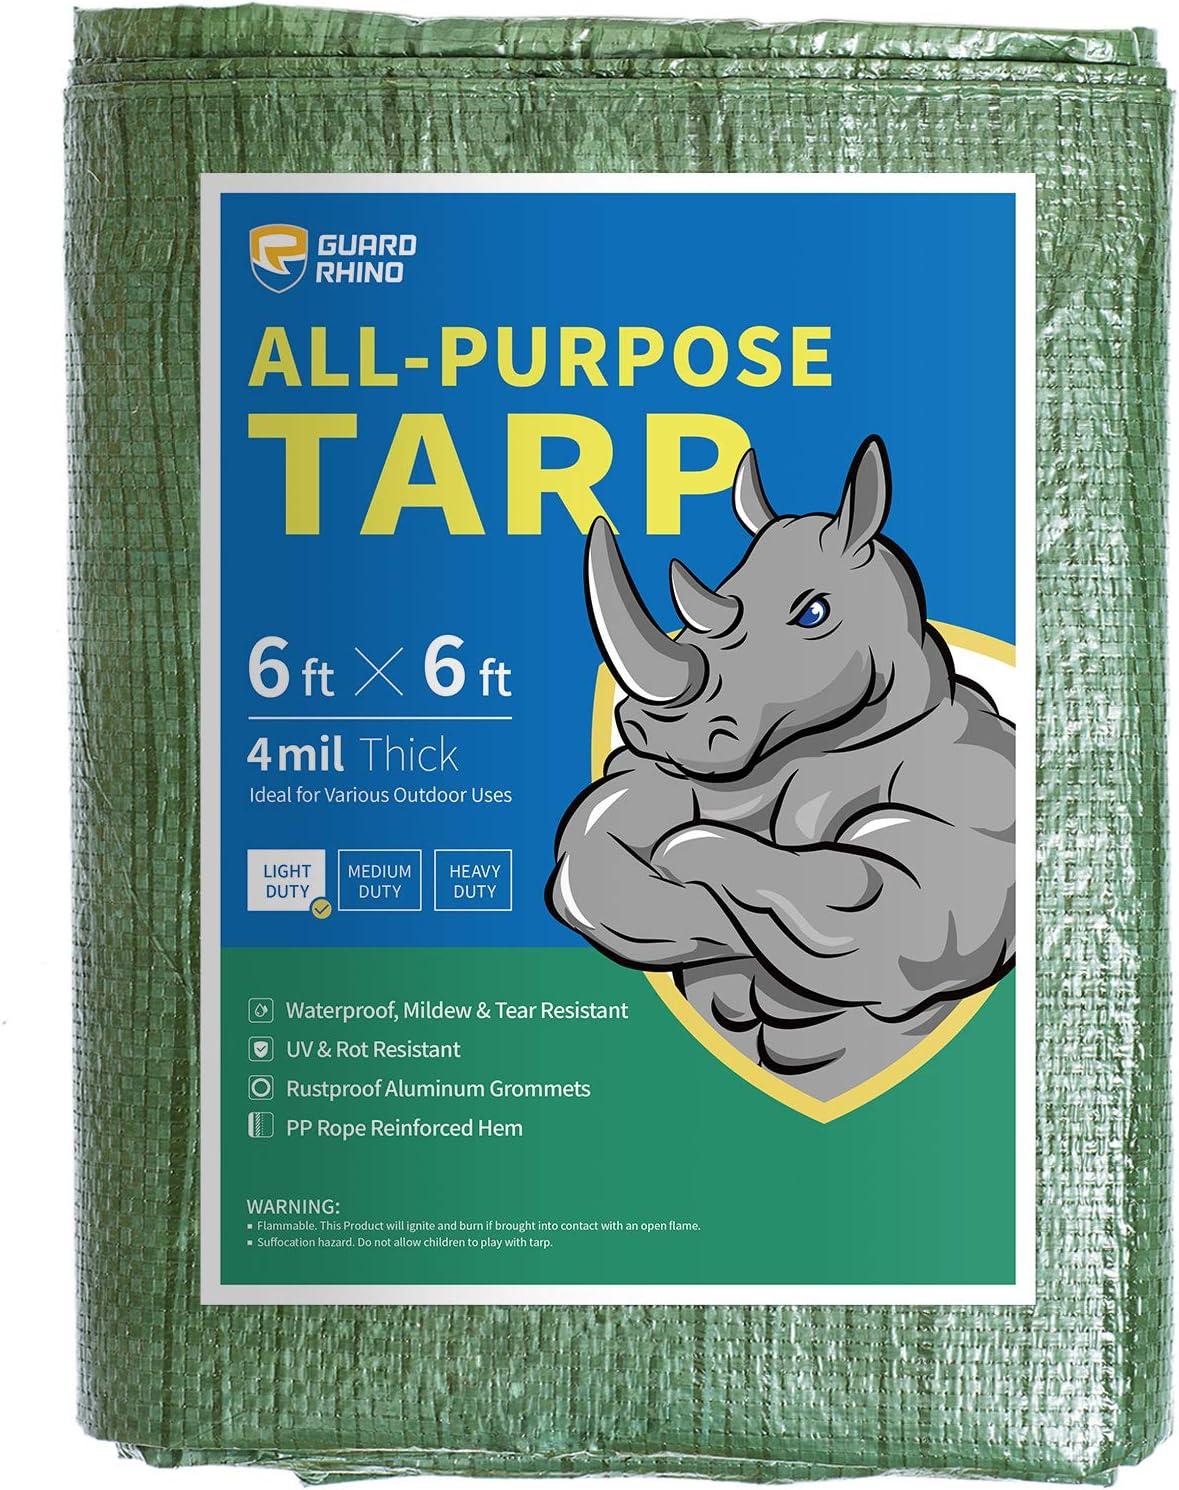 GUARD RHINO Tarp New product type It is very popular 6x6 Feet Green Purpose Ta Waterproof Multi Poly